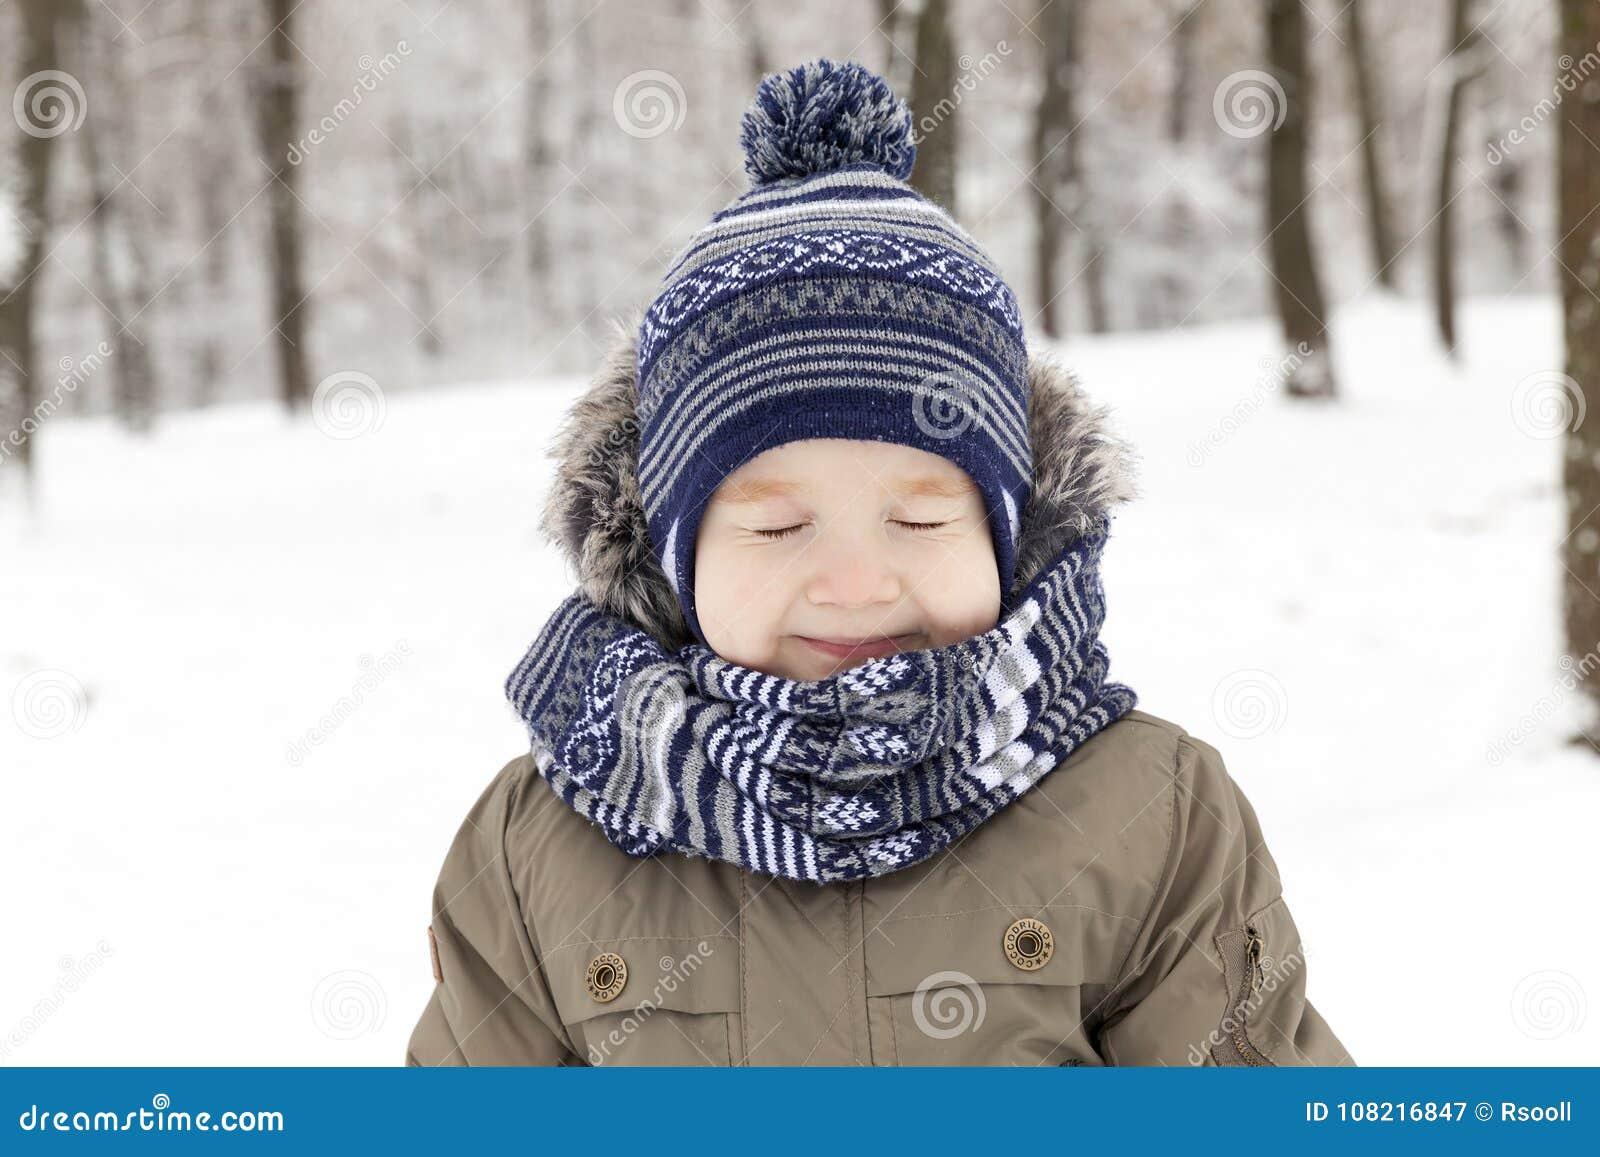 Child in winter, portrait squint blink